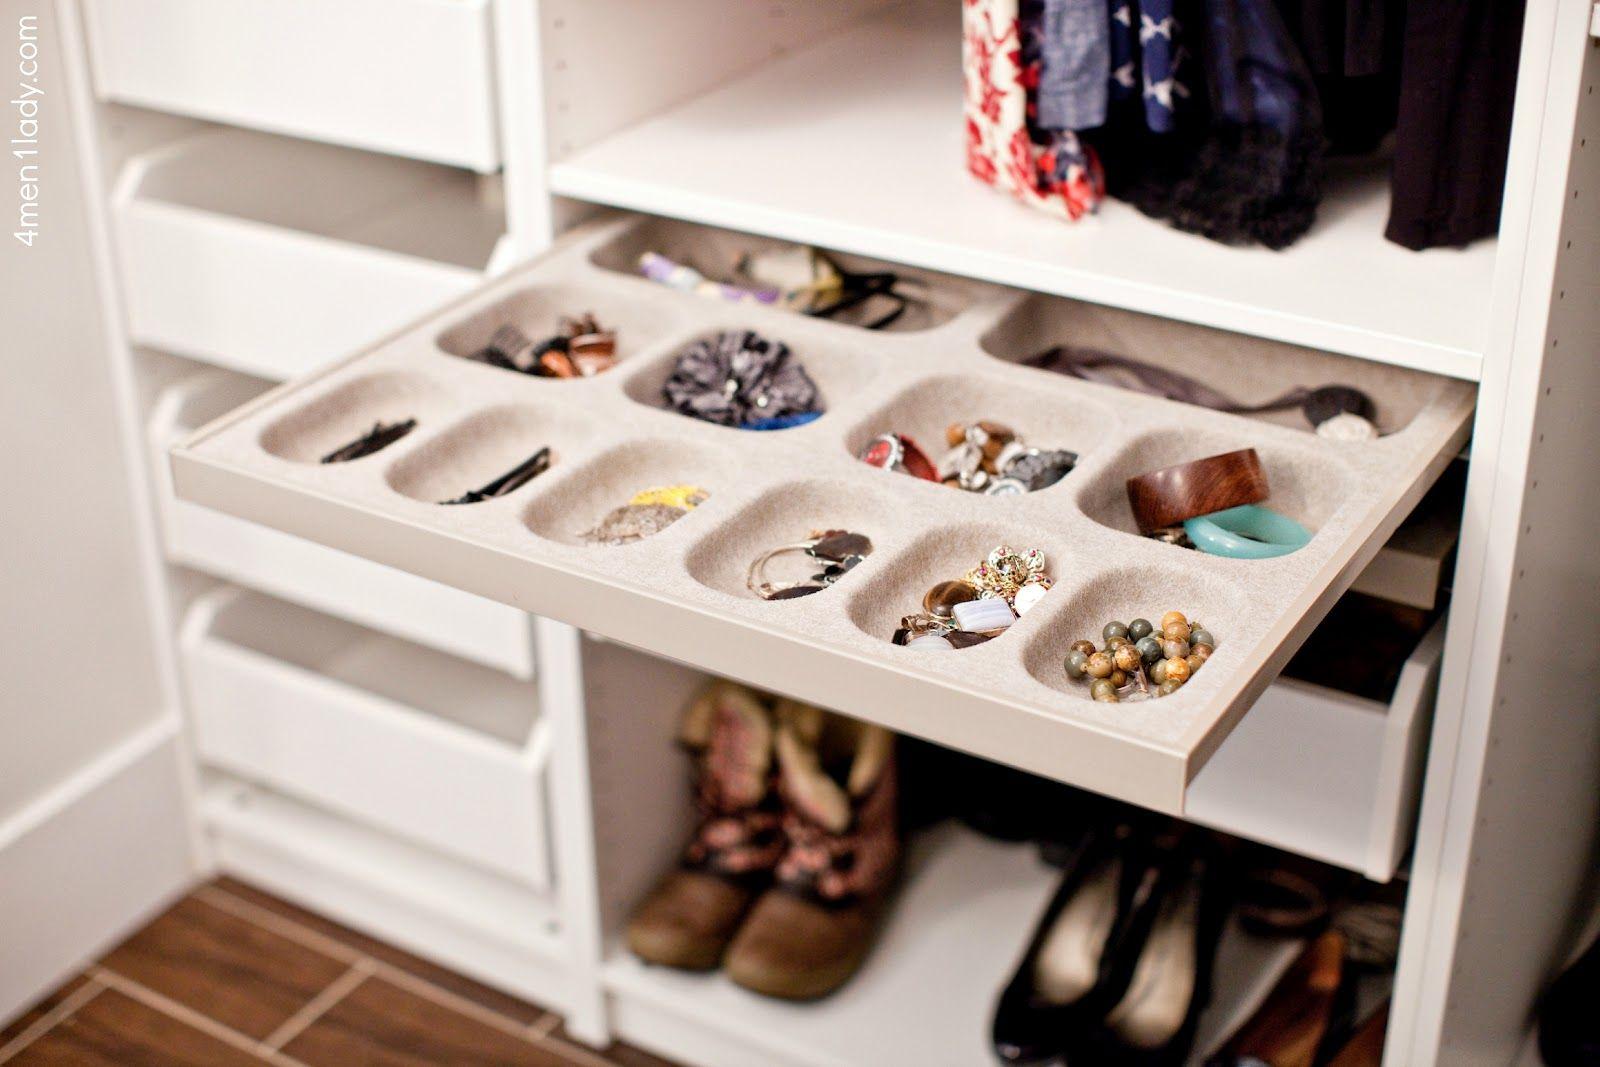 Jewelry ClosetJewellery StorageJewelry U2026 17 Best Images About Storage On  Pinterest | Jewelery, Boot Organization And Closet